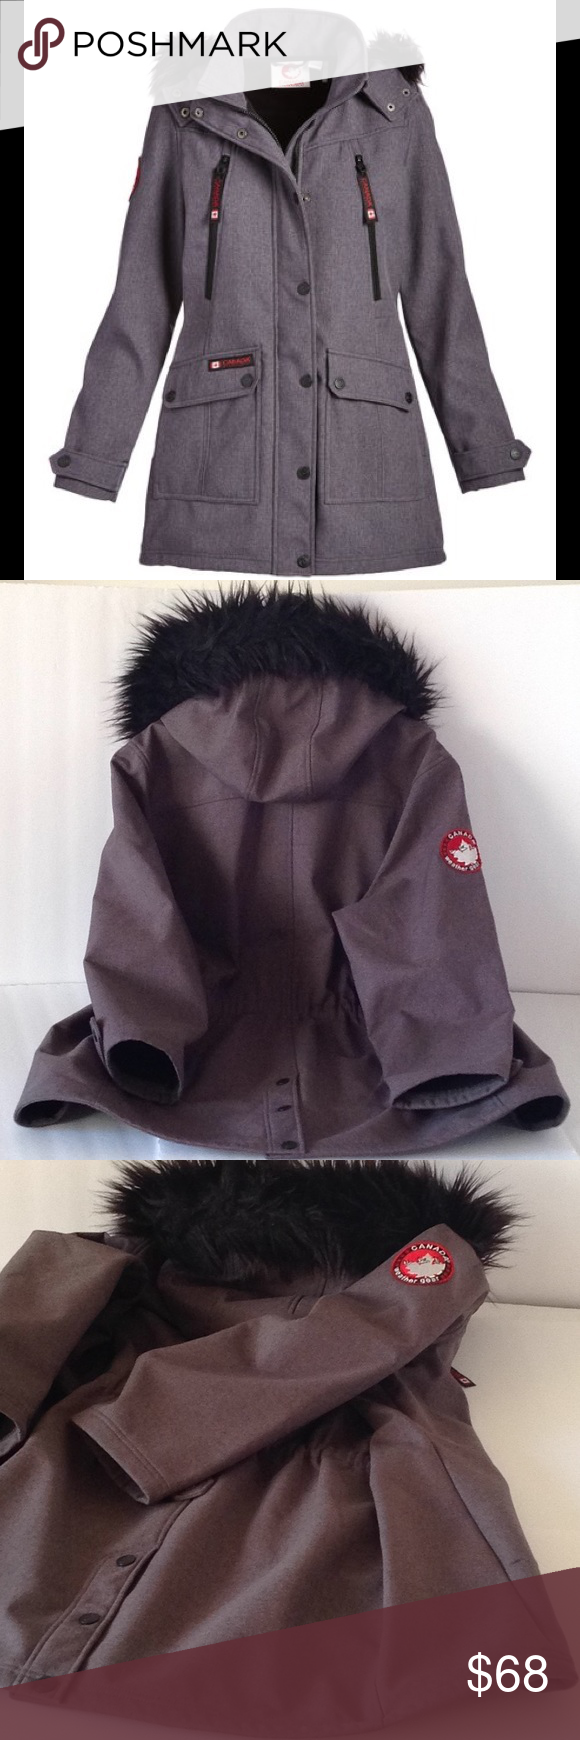 Canada Weather Gear Fur Trim Hooded Jacket Hooded Jacket Fur Trim Jackets [ 1740 x 580 Pixel ]